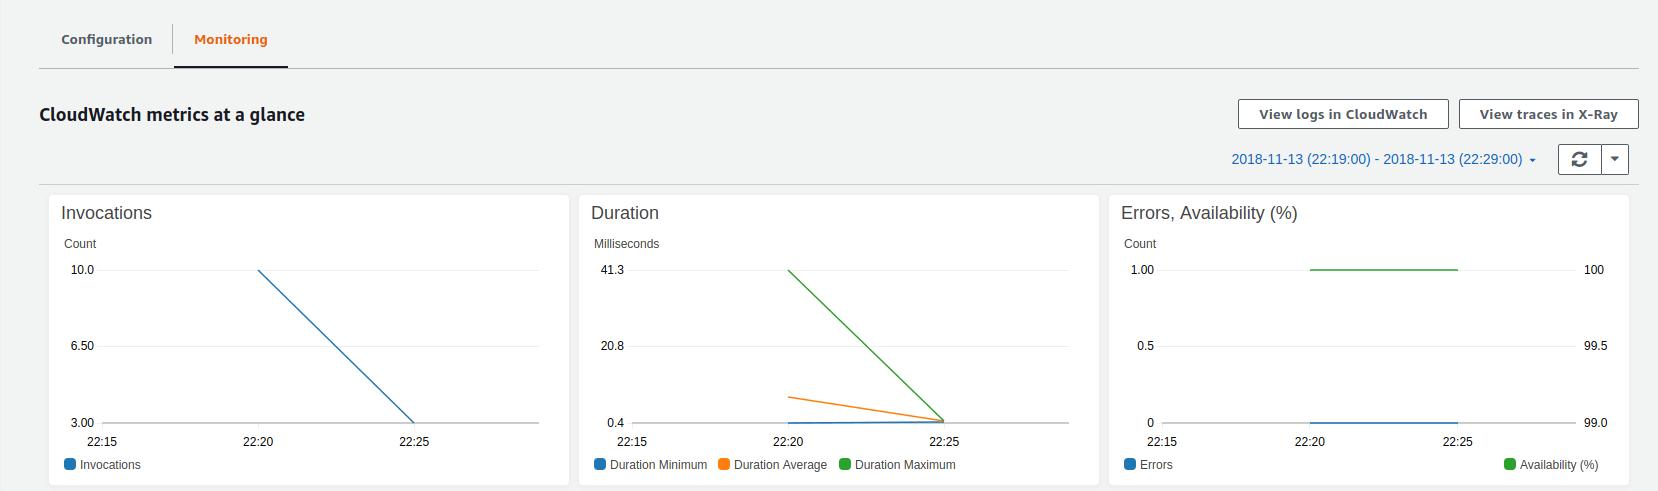 CloudWatch metrics in the Monitoring tab